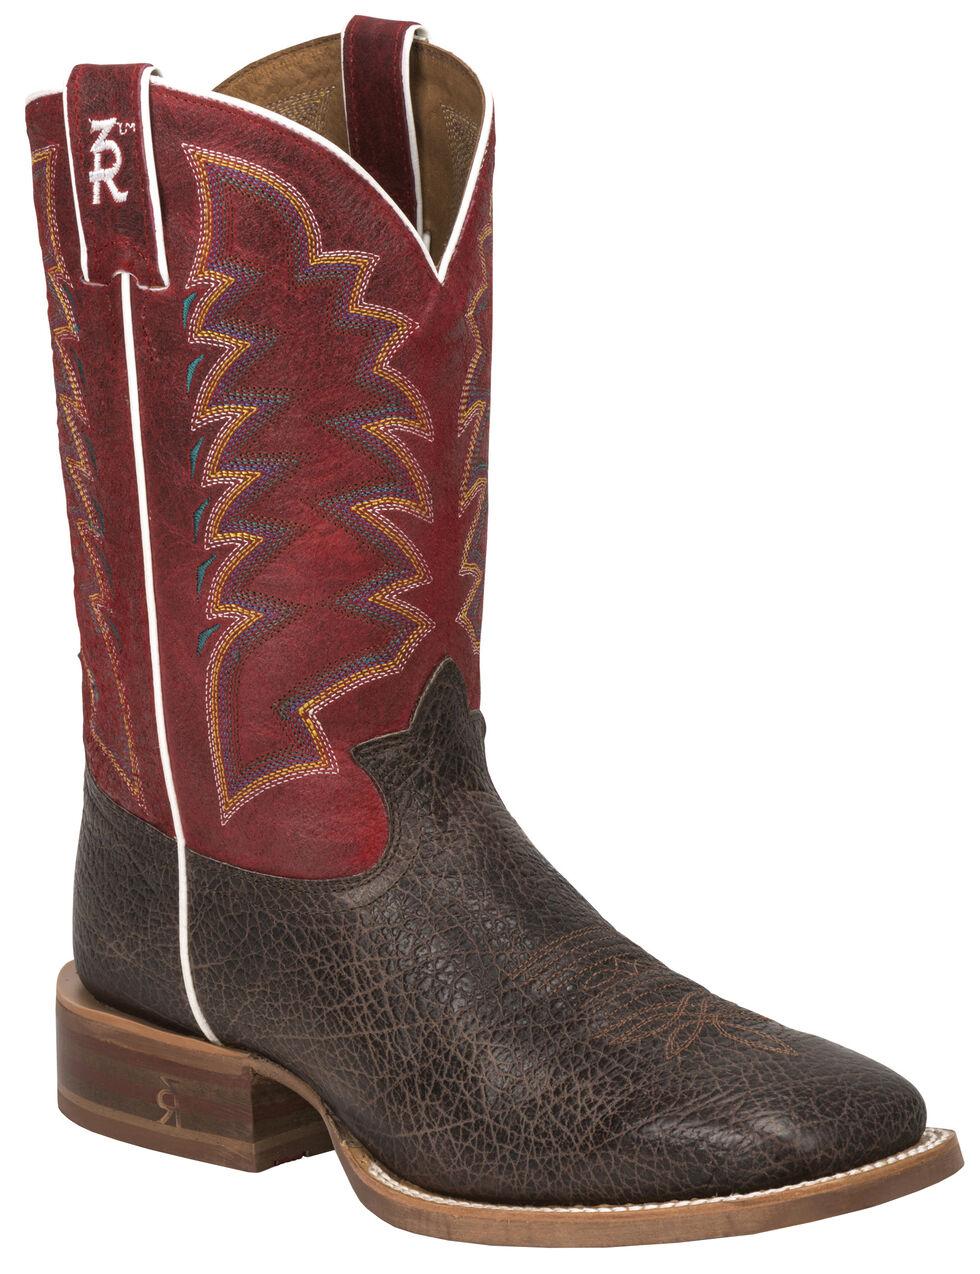 Tony Lama Cafe Bonham 3R Stockman Boots - Wide Square Toe, Dark Brown, hi-res